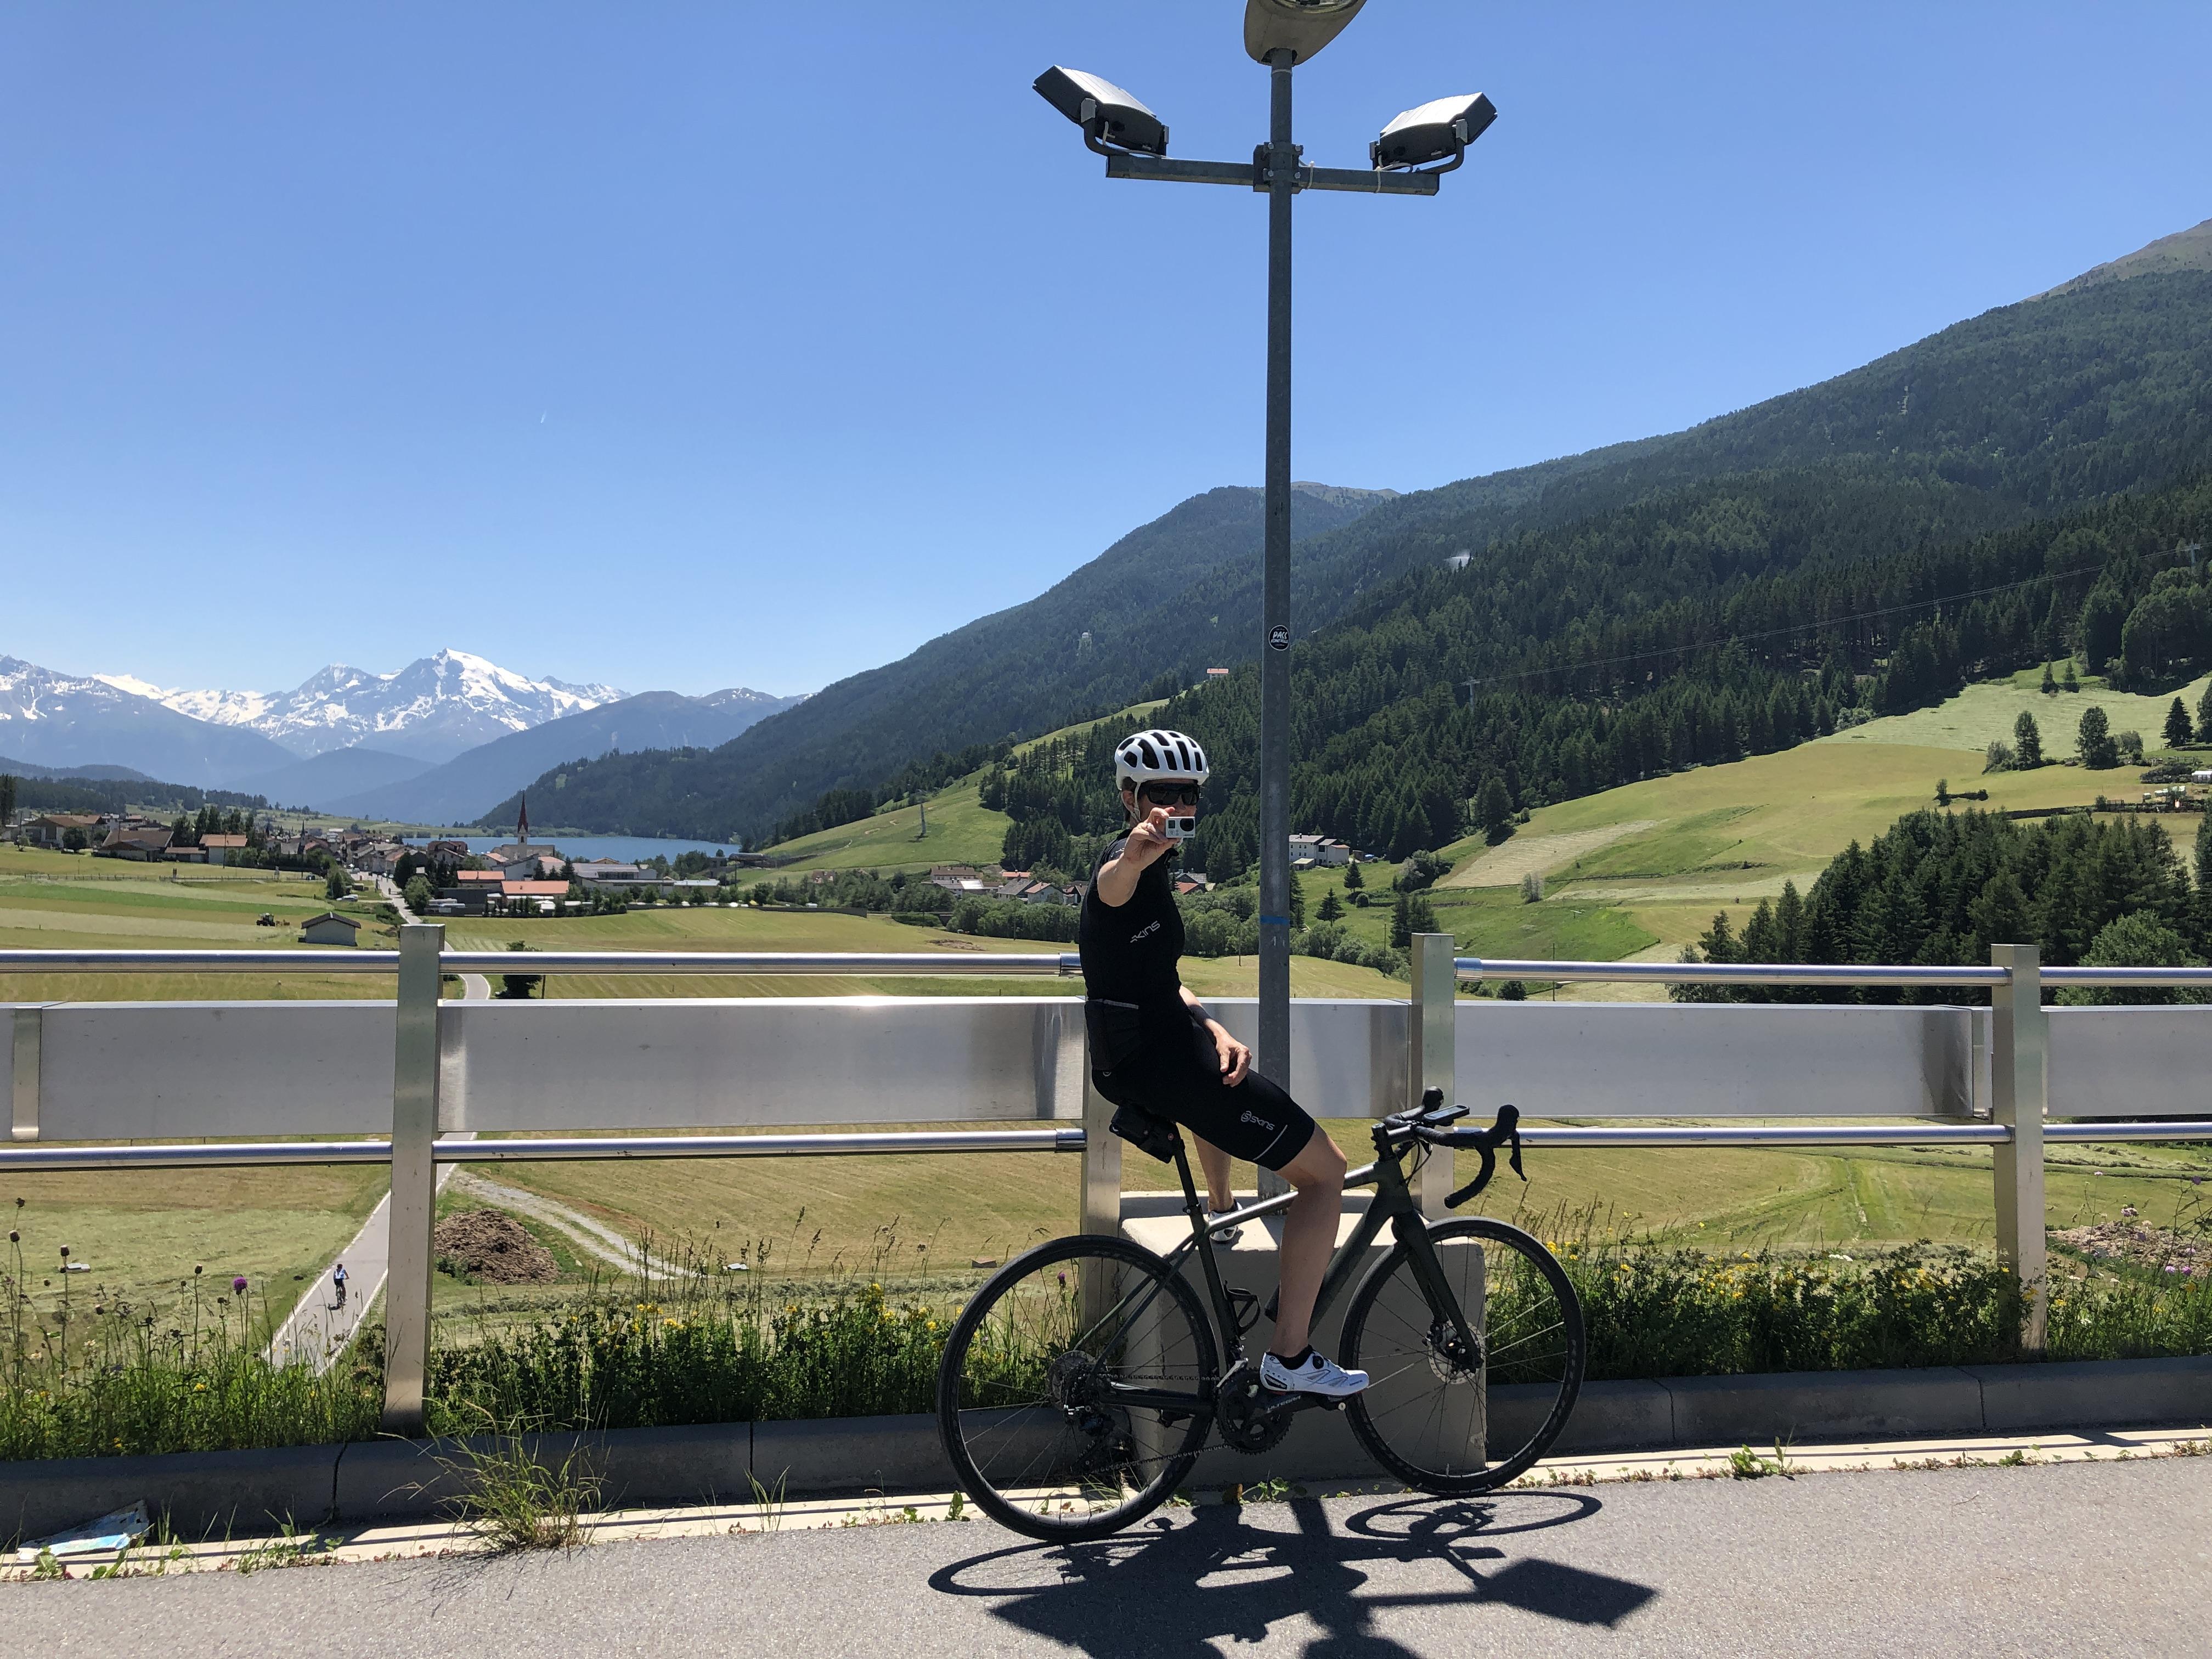 CyclingClubDuesseldorf-Dreiländergiro-Frau K knipst zurück